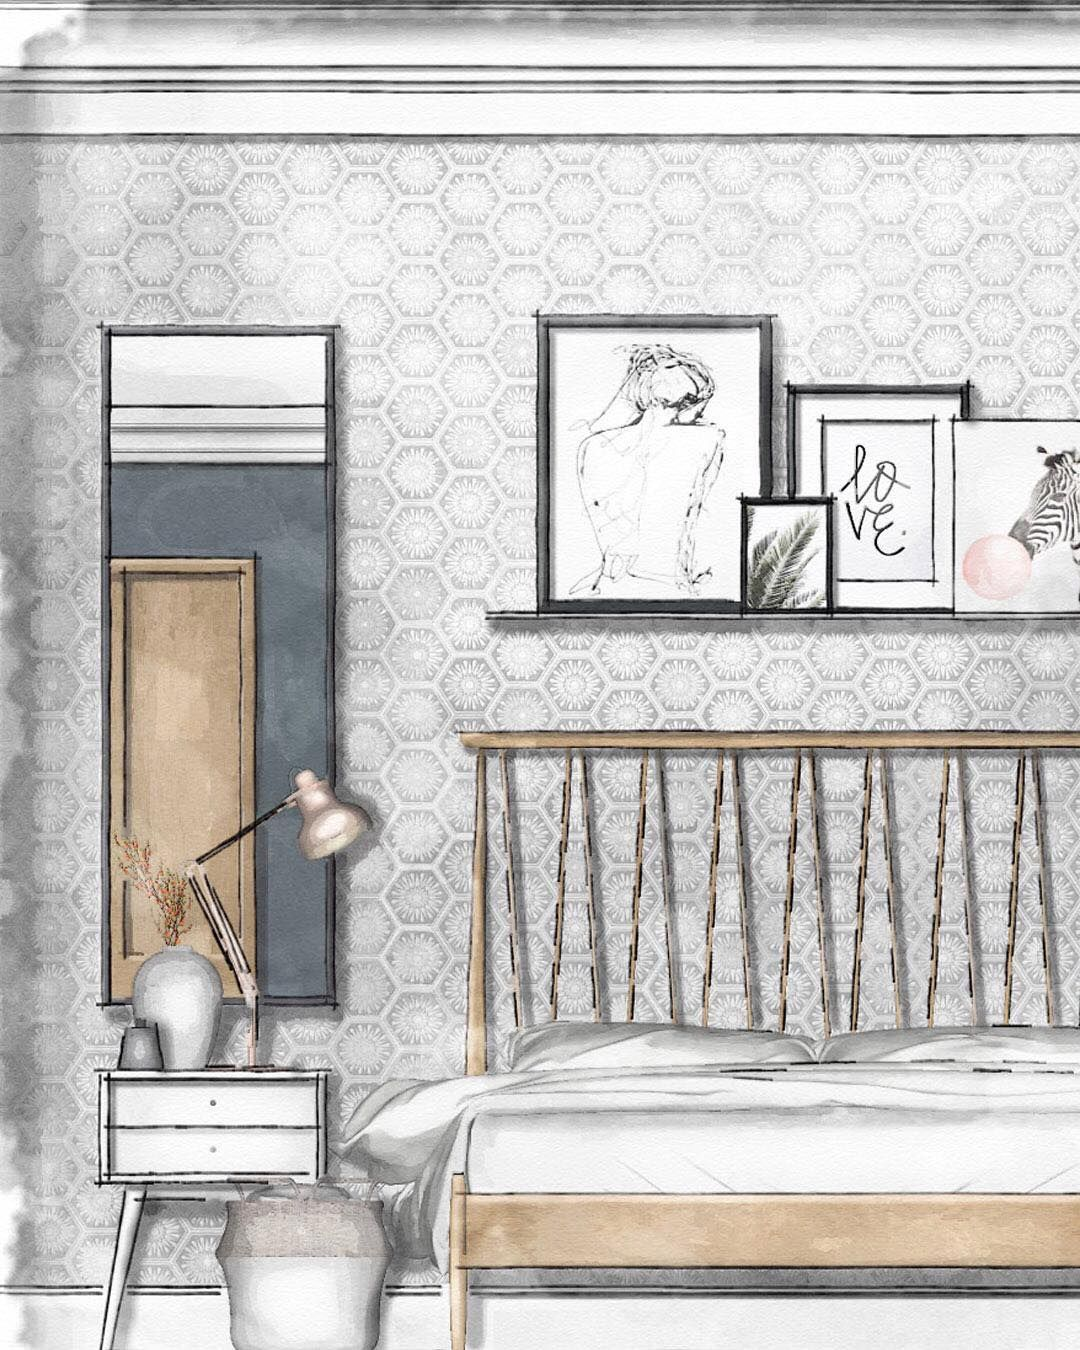 Living Room Sketch: 이미지: 실내